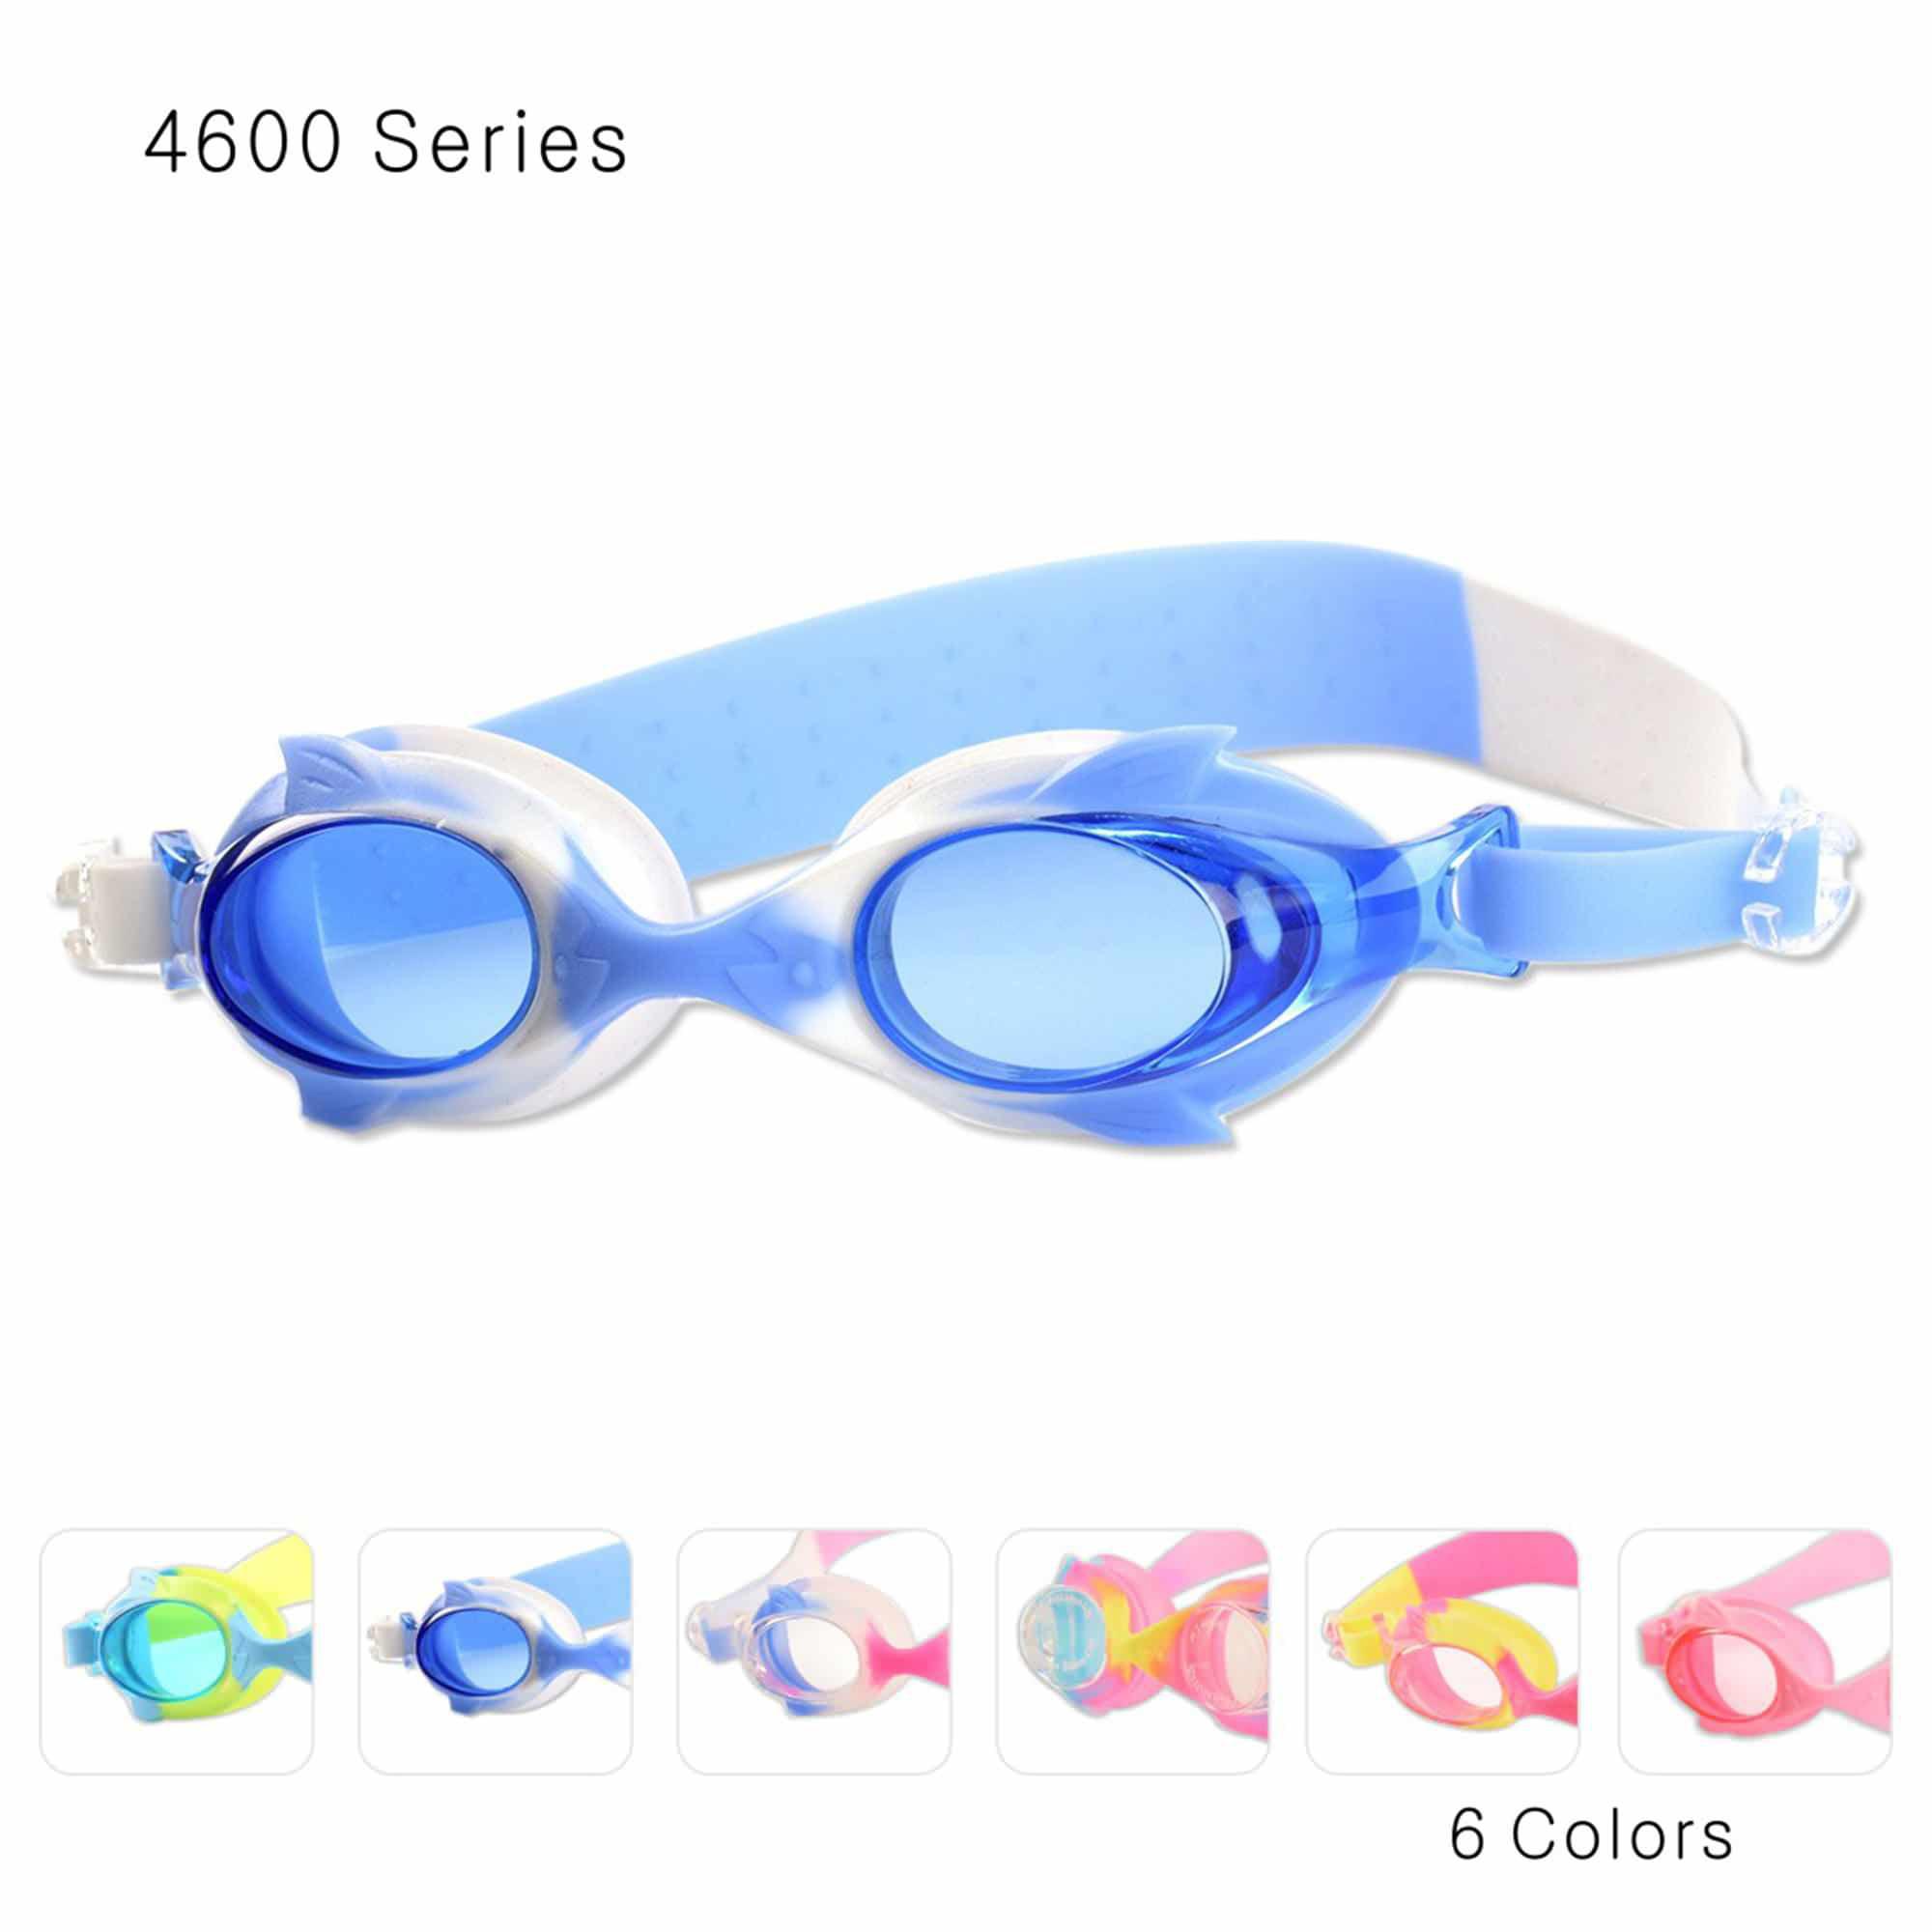 JML Kids Swim Goggles, Anti-Fog UV Protection Swimming Goggles(4600-Blue Yellow) by JML